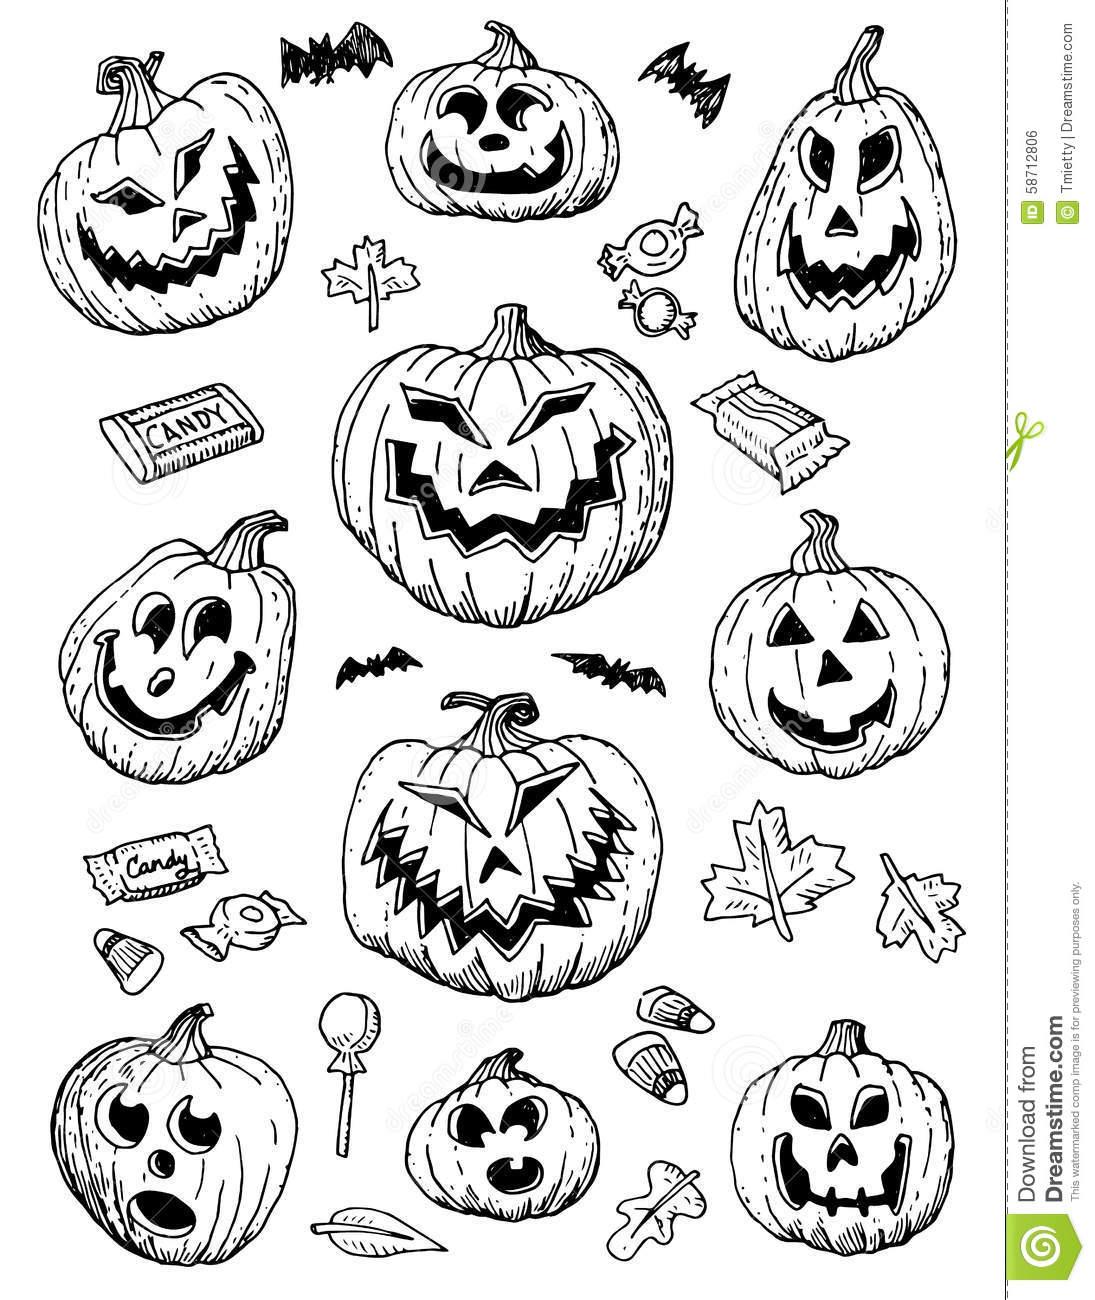 1095x1300 Image Result For Hand Drawn Halloween Jack O Lanterns Resin